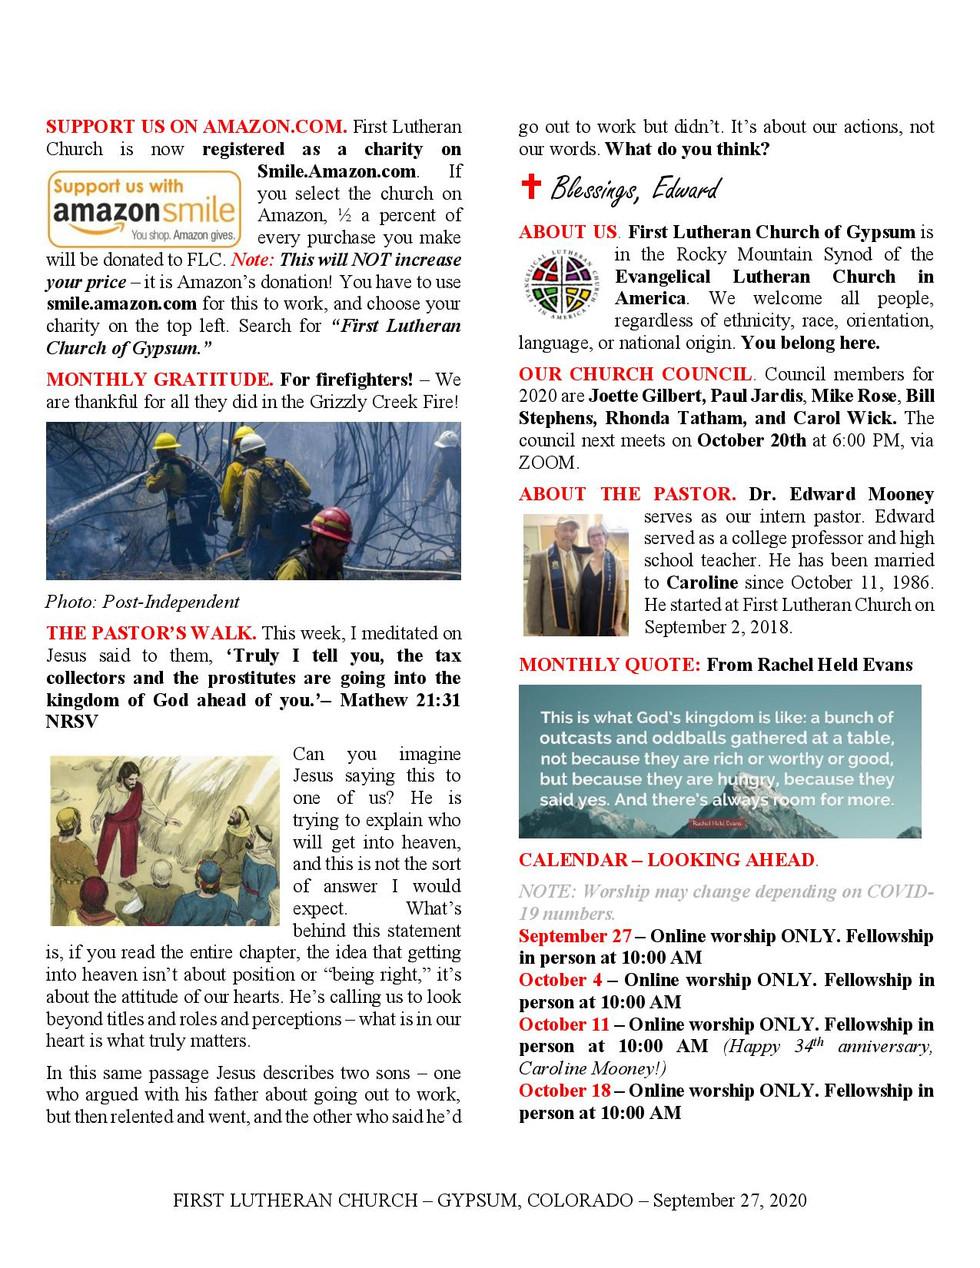 Newsletter, September 27, 2020, page 2